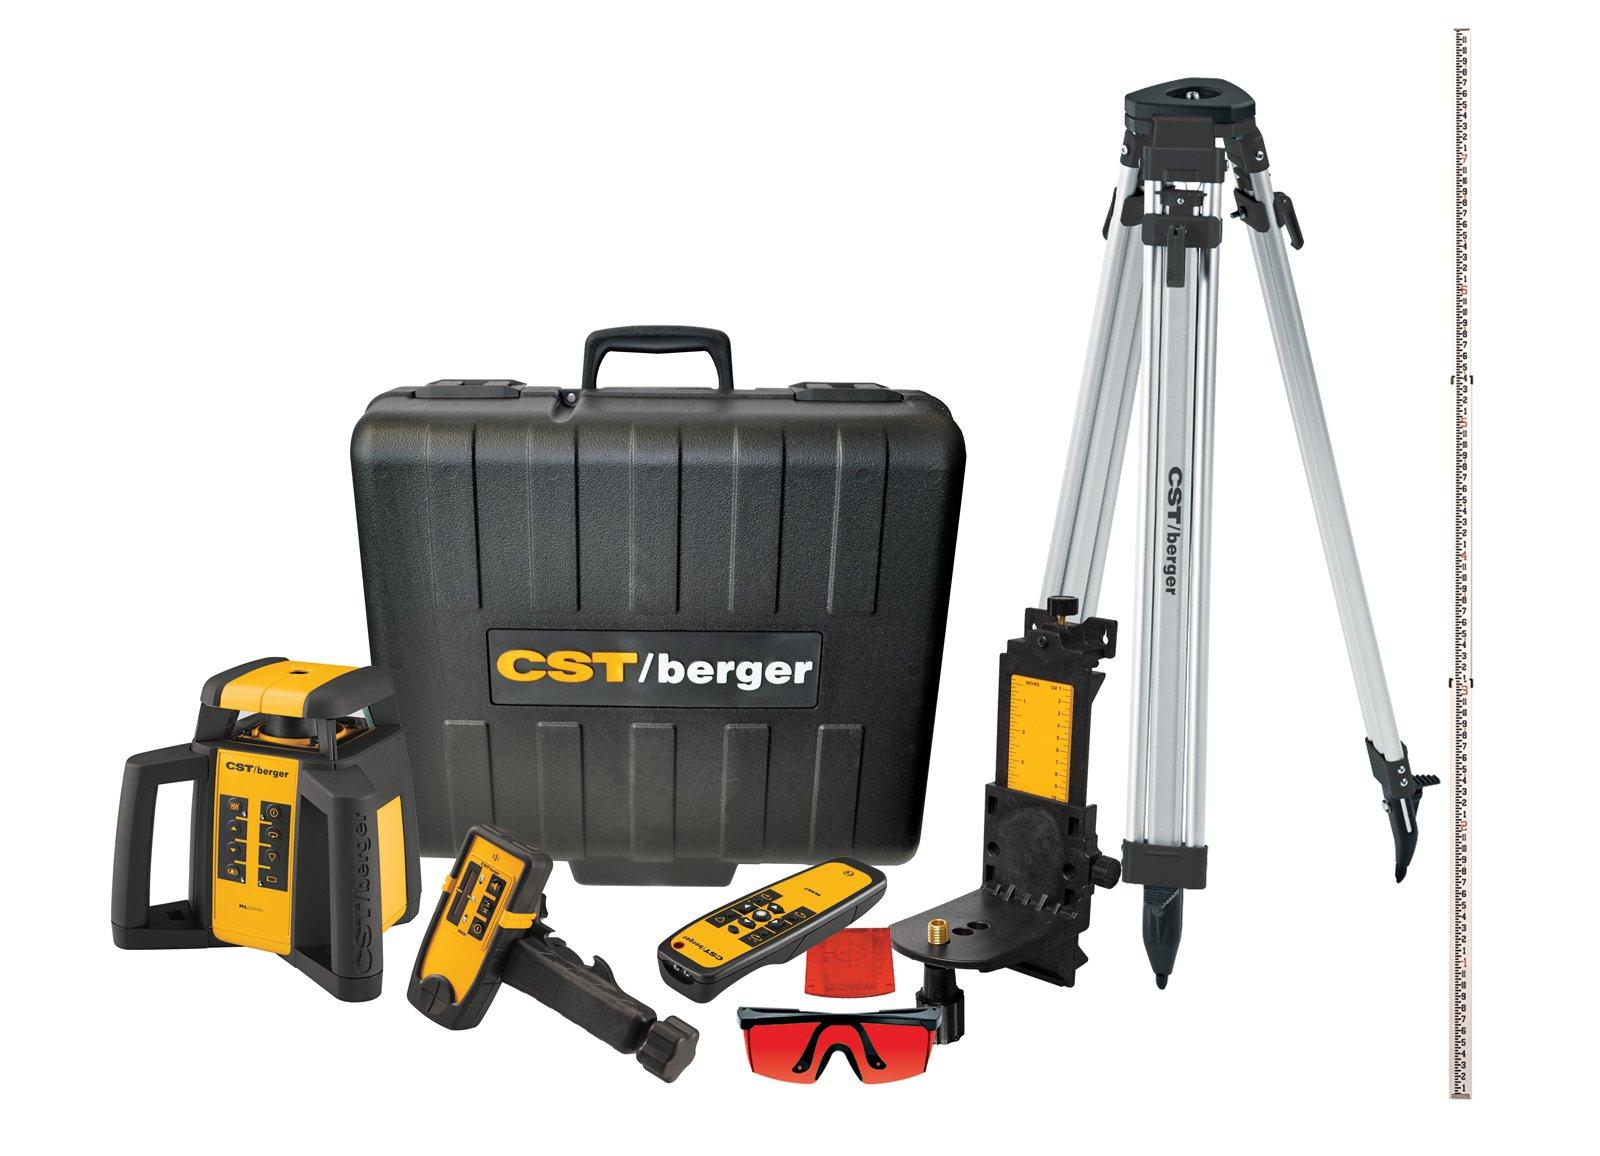 CST/berger RL25HVCK Horizontal/Vertical, Interior/Exterior Rotary Laser Complete Kit